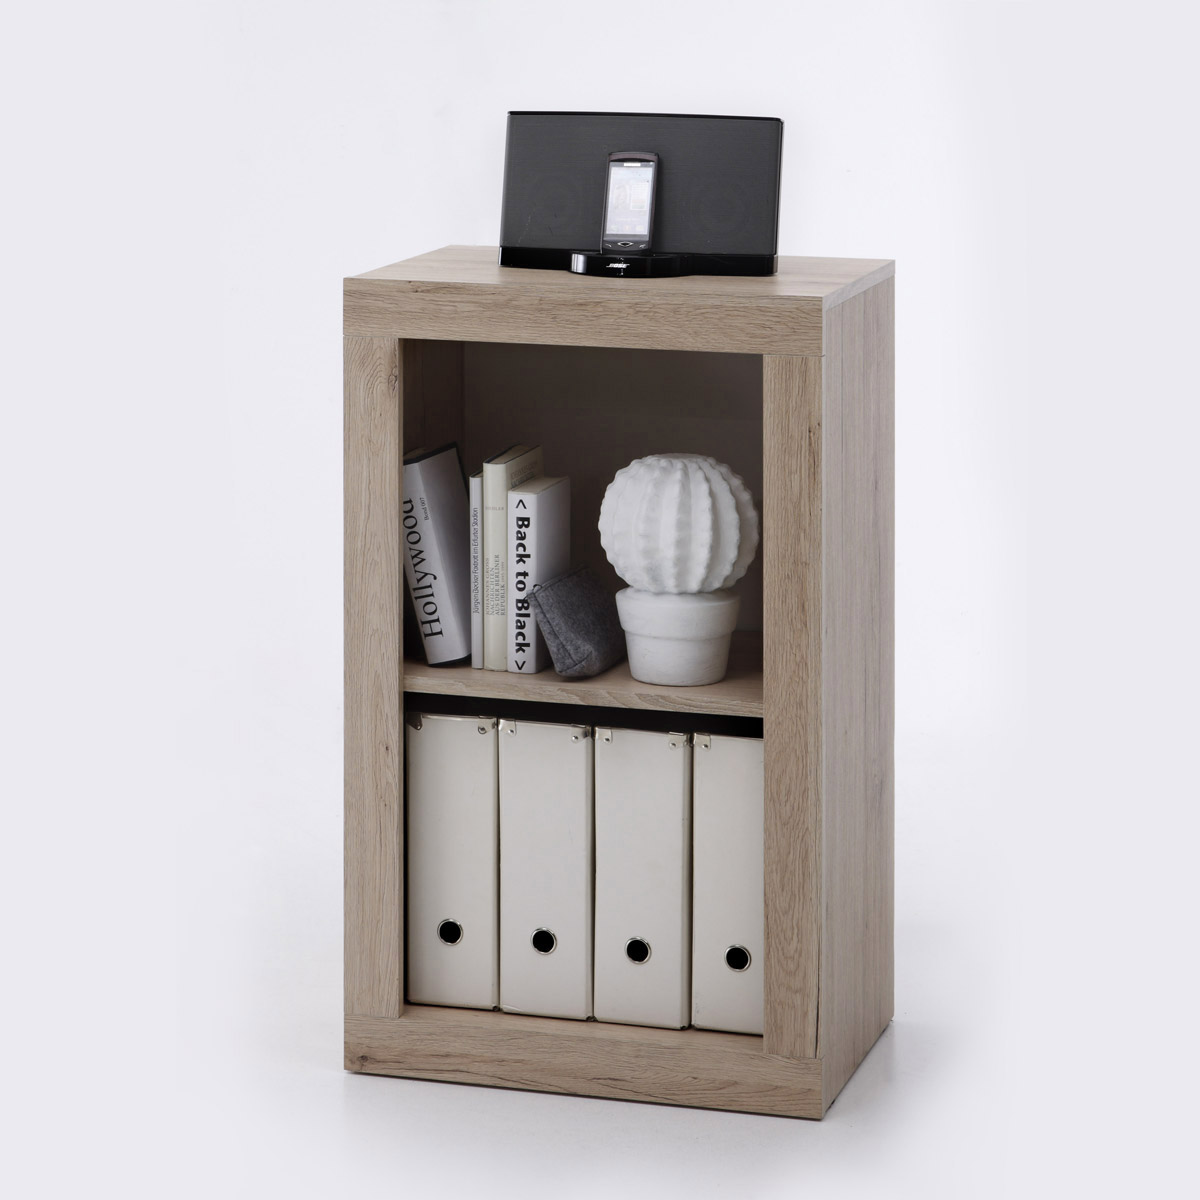 regal 1 can can regalelement stauraumelement schrank san remo eiche ebay. Black Bedroom Furniture Sets. Home Design Ideas